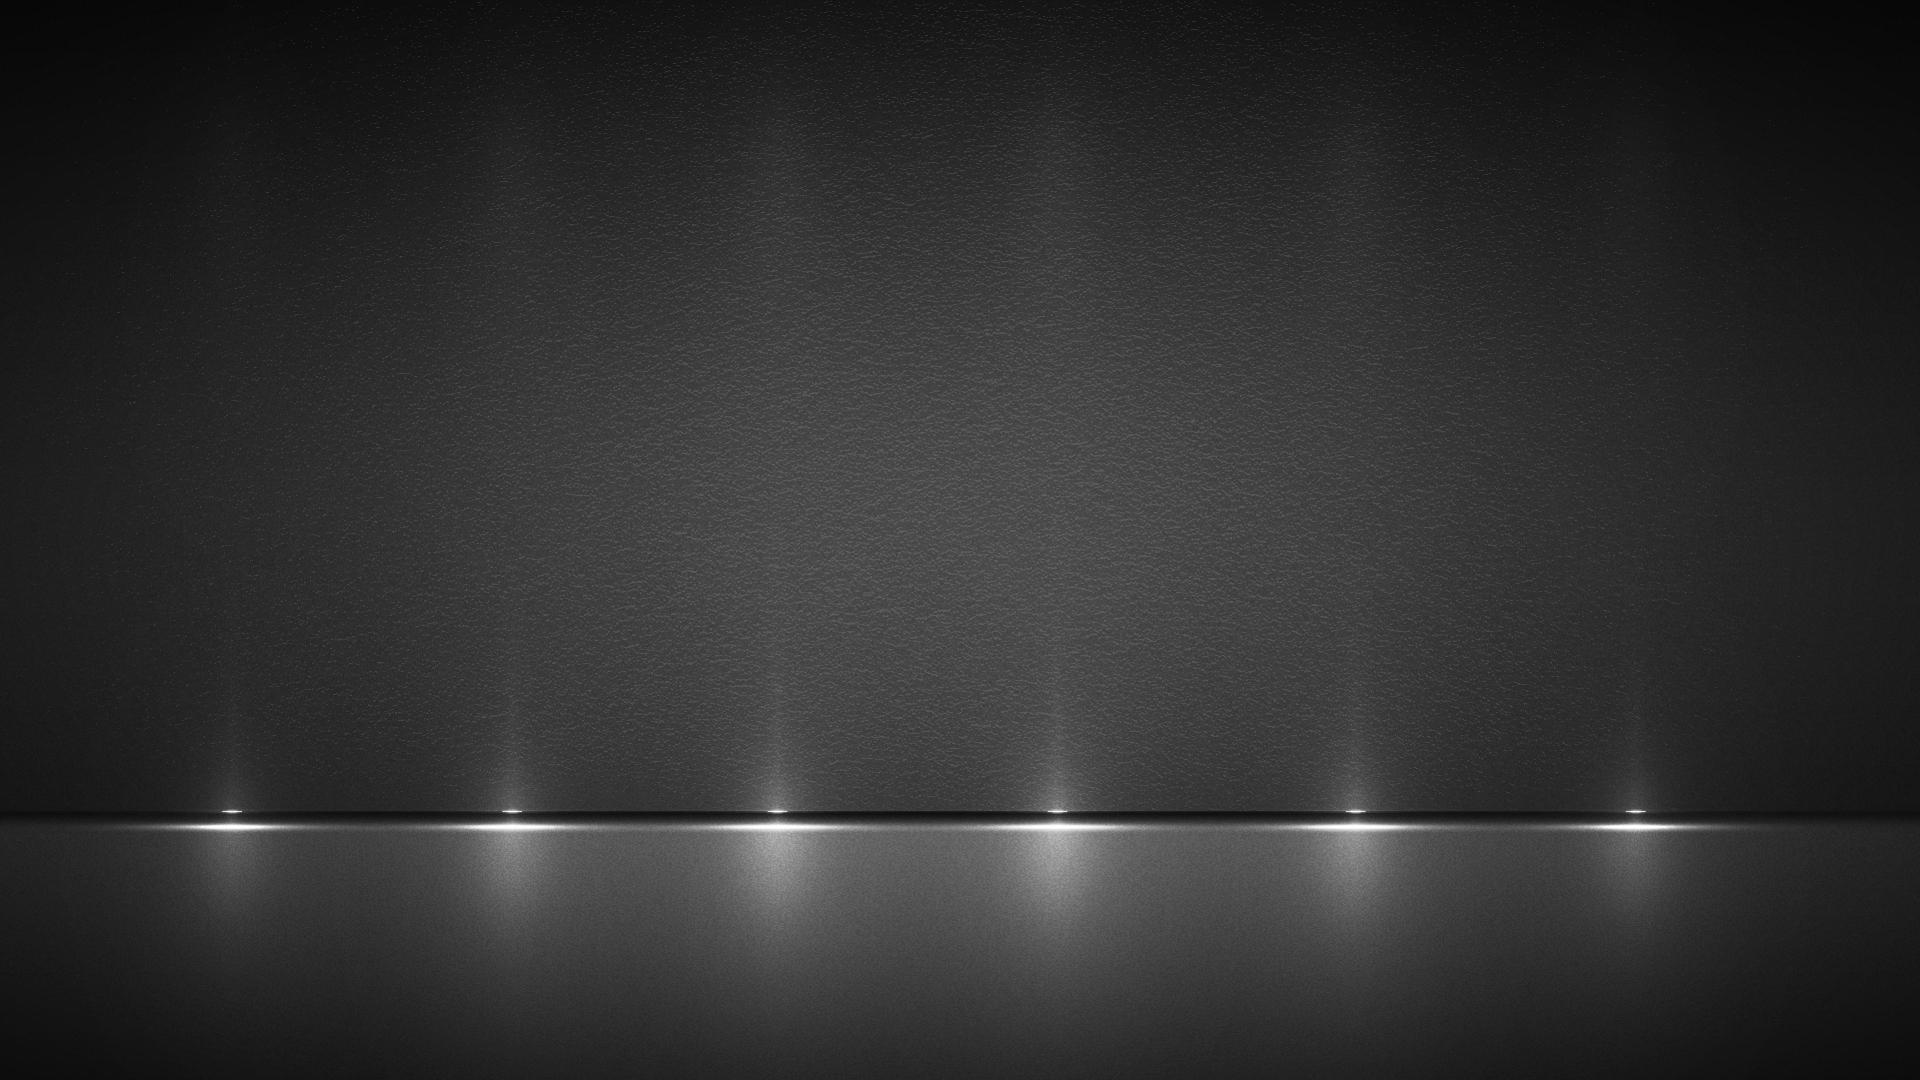 grey illumination background presentations powerpoint backgroundsjpg 1920x1080